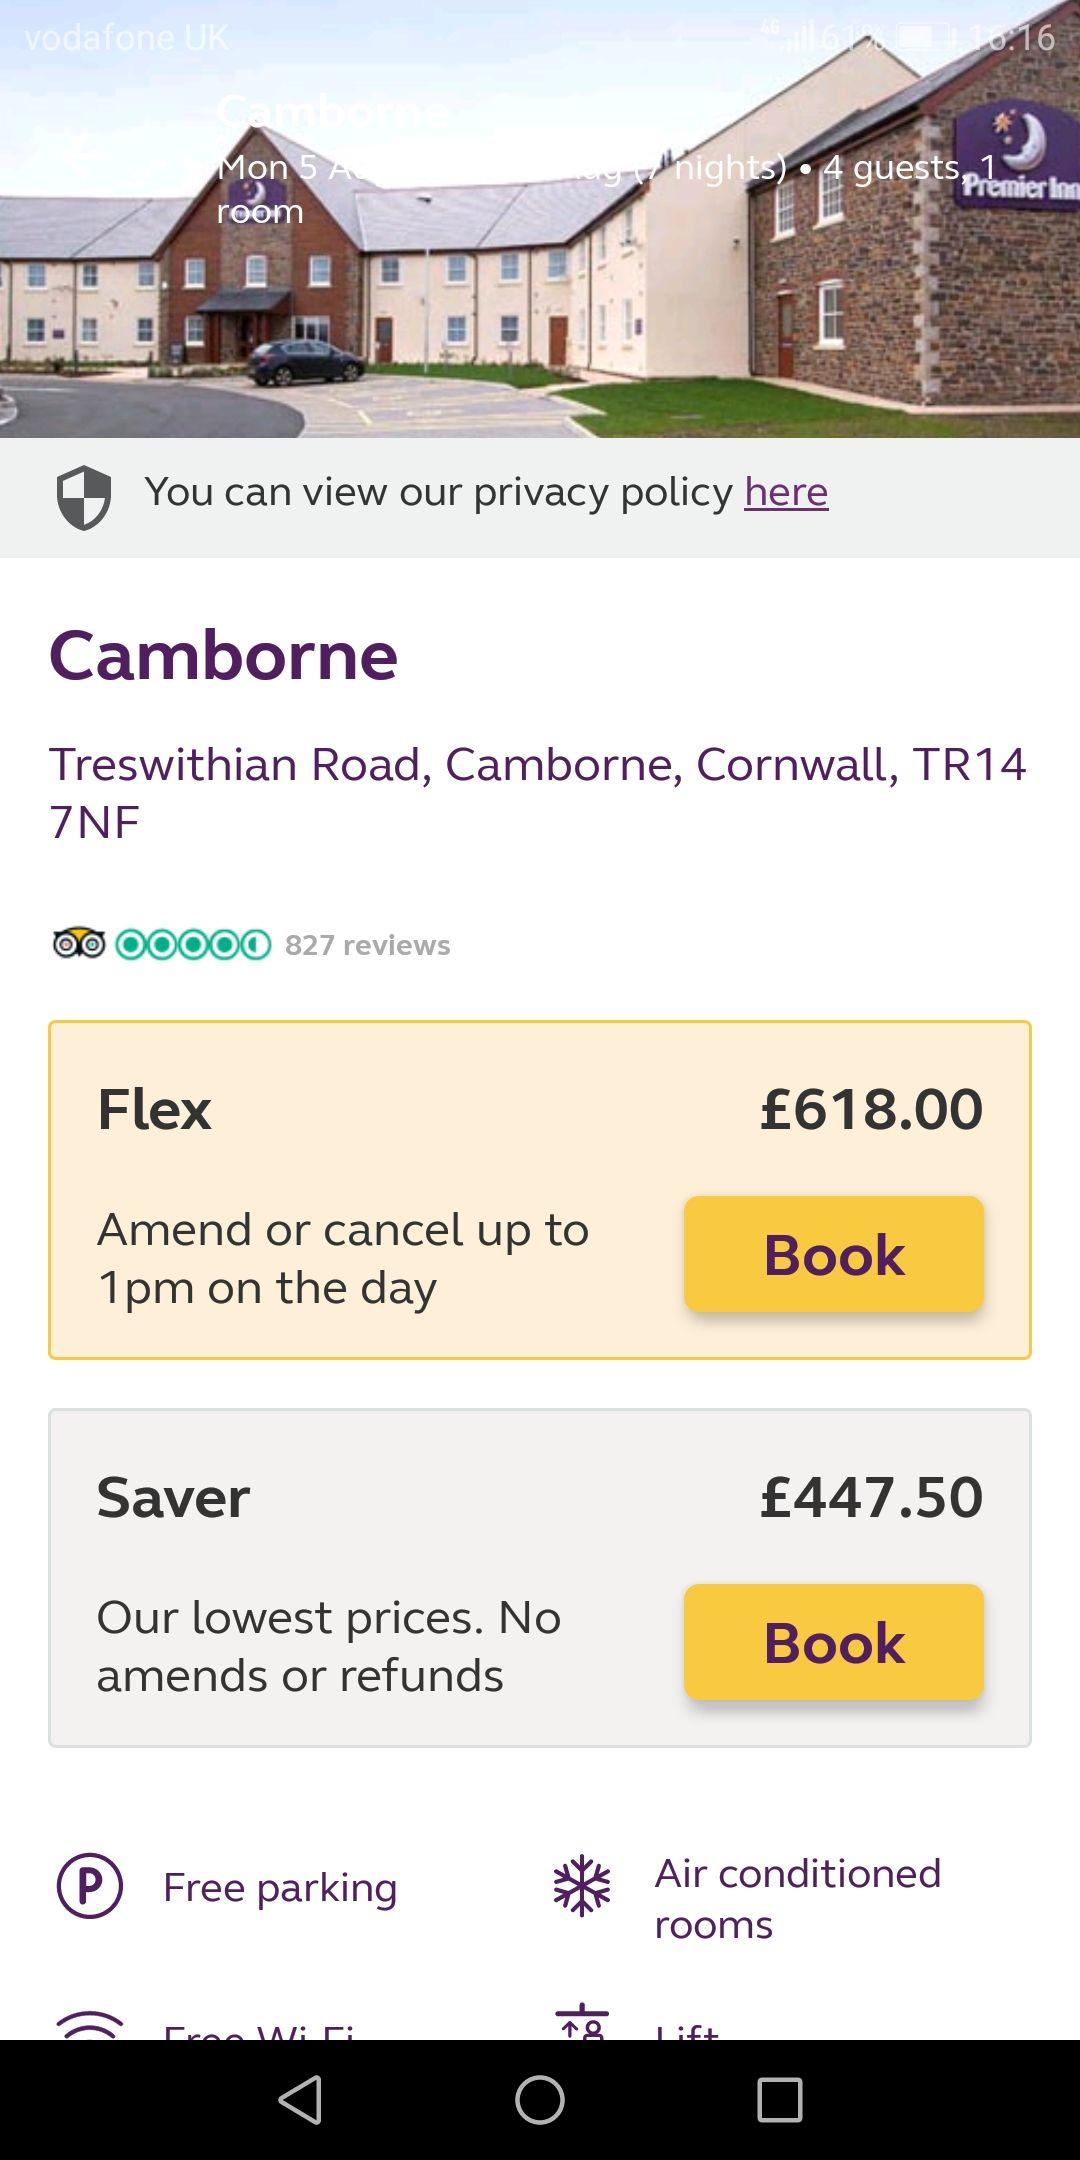 Premier inn Camborne Cornwall 05/08/19 - 12/08/19, 2 adults, 2 children £447.50